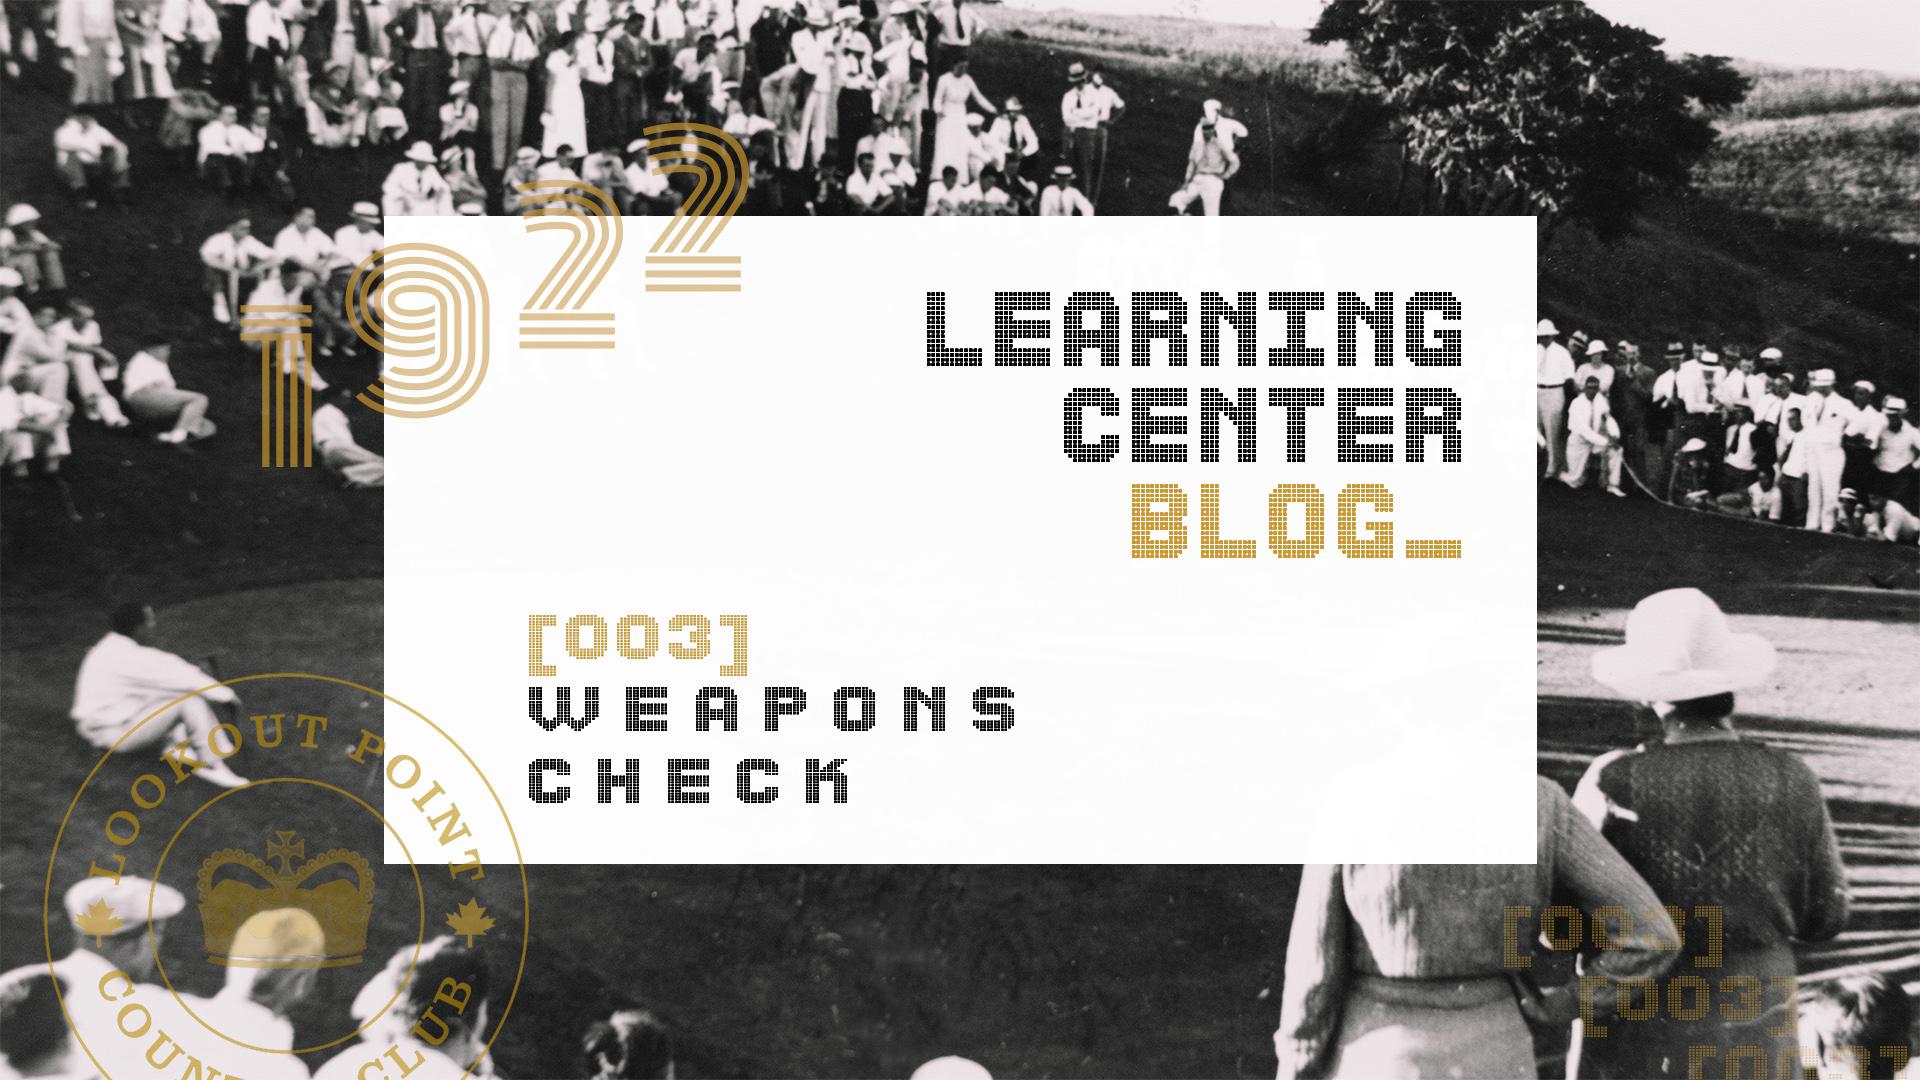 LPCC_LC_Blog_Cover_003.jpg